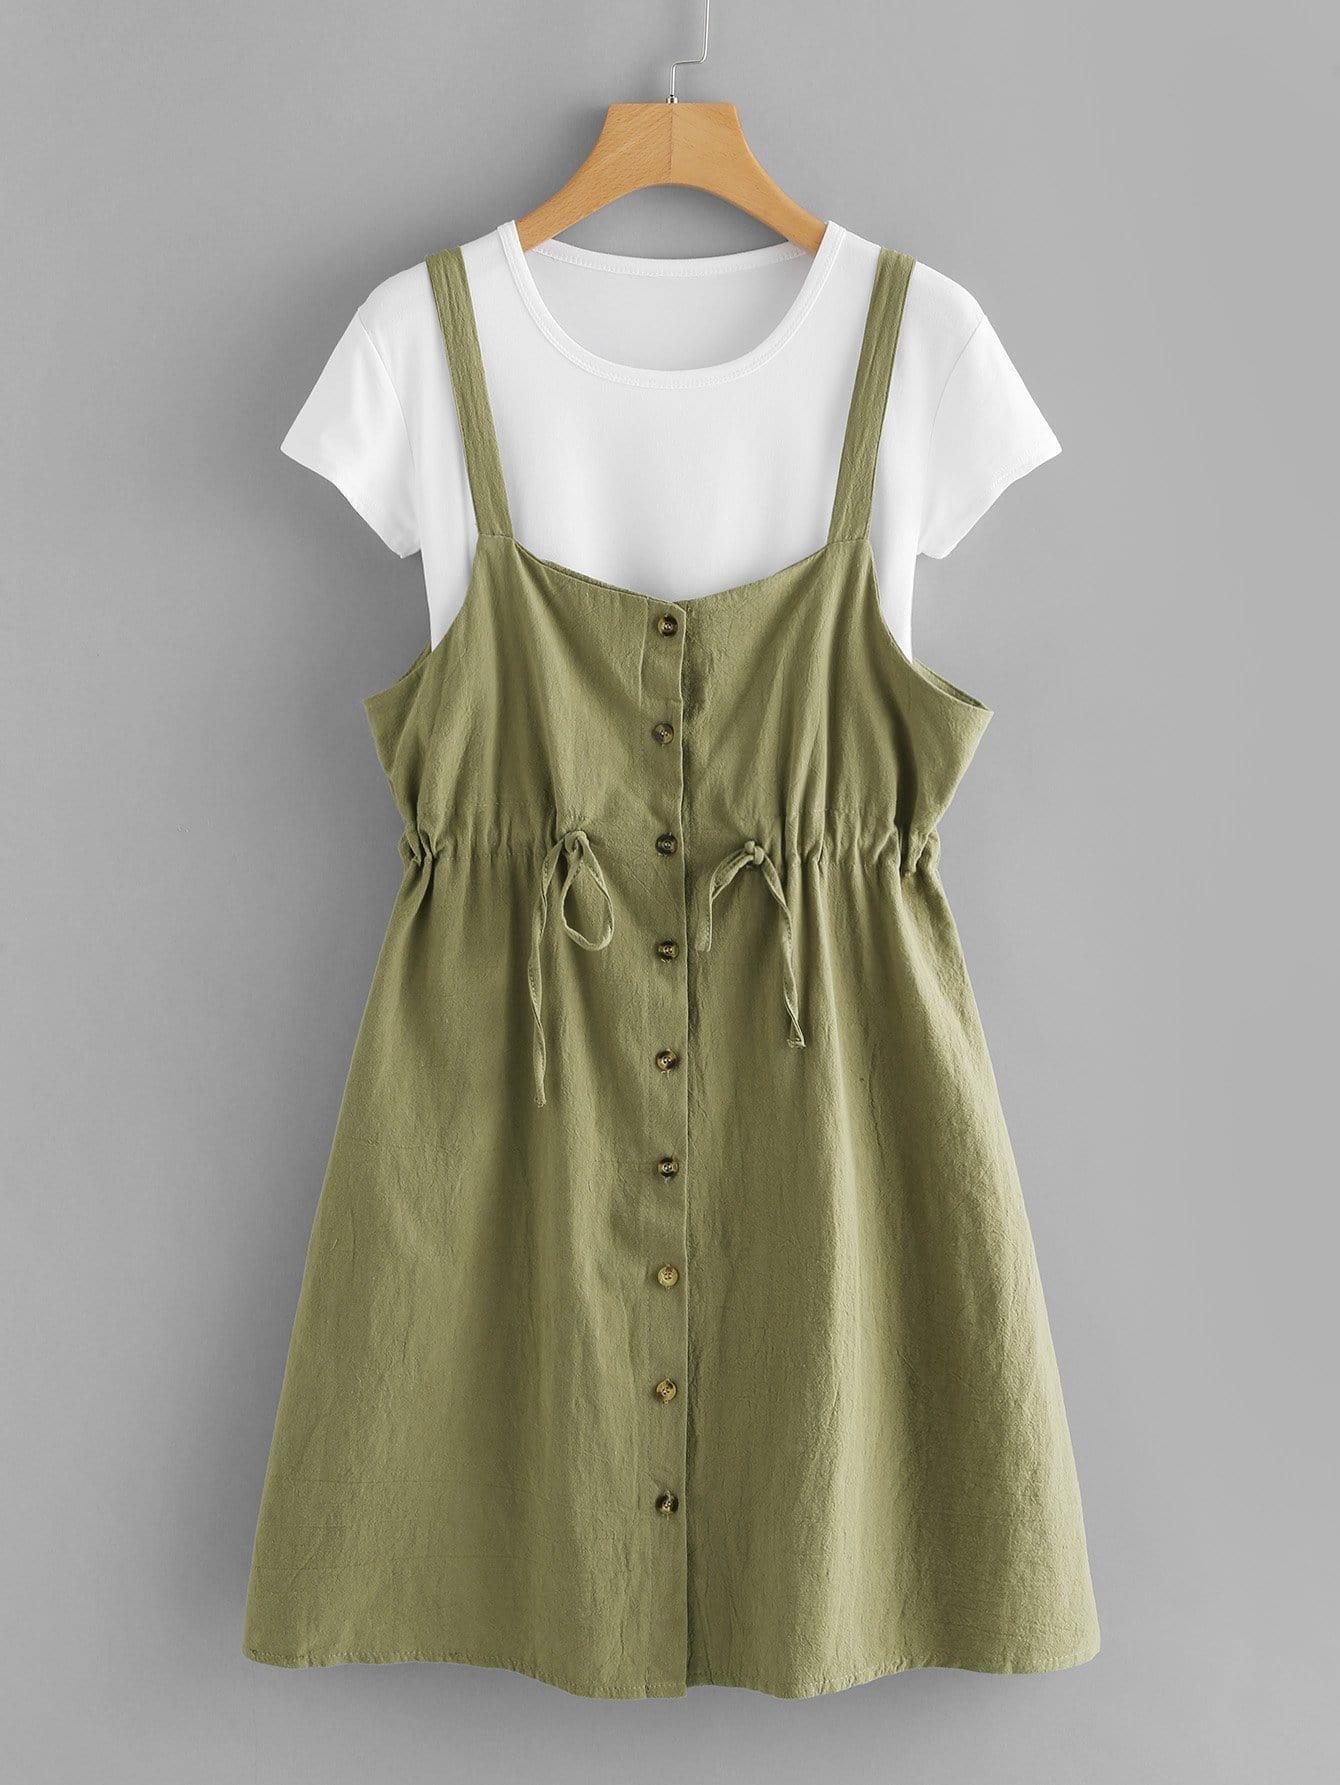 Drawstring Waist Button Front Strap Dress & Tee button front strap dress